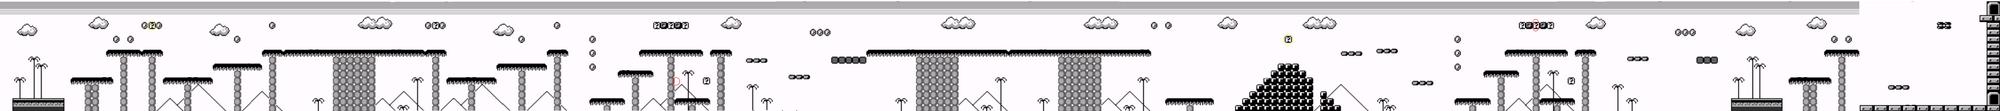 SML Screenshot Level 1-2